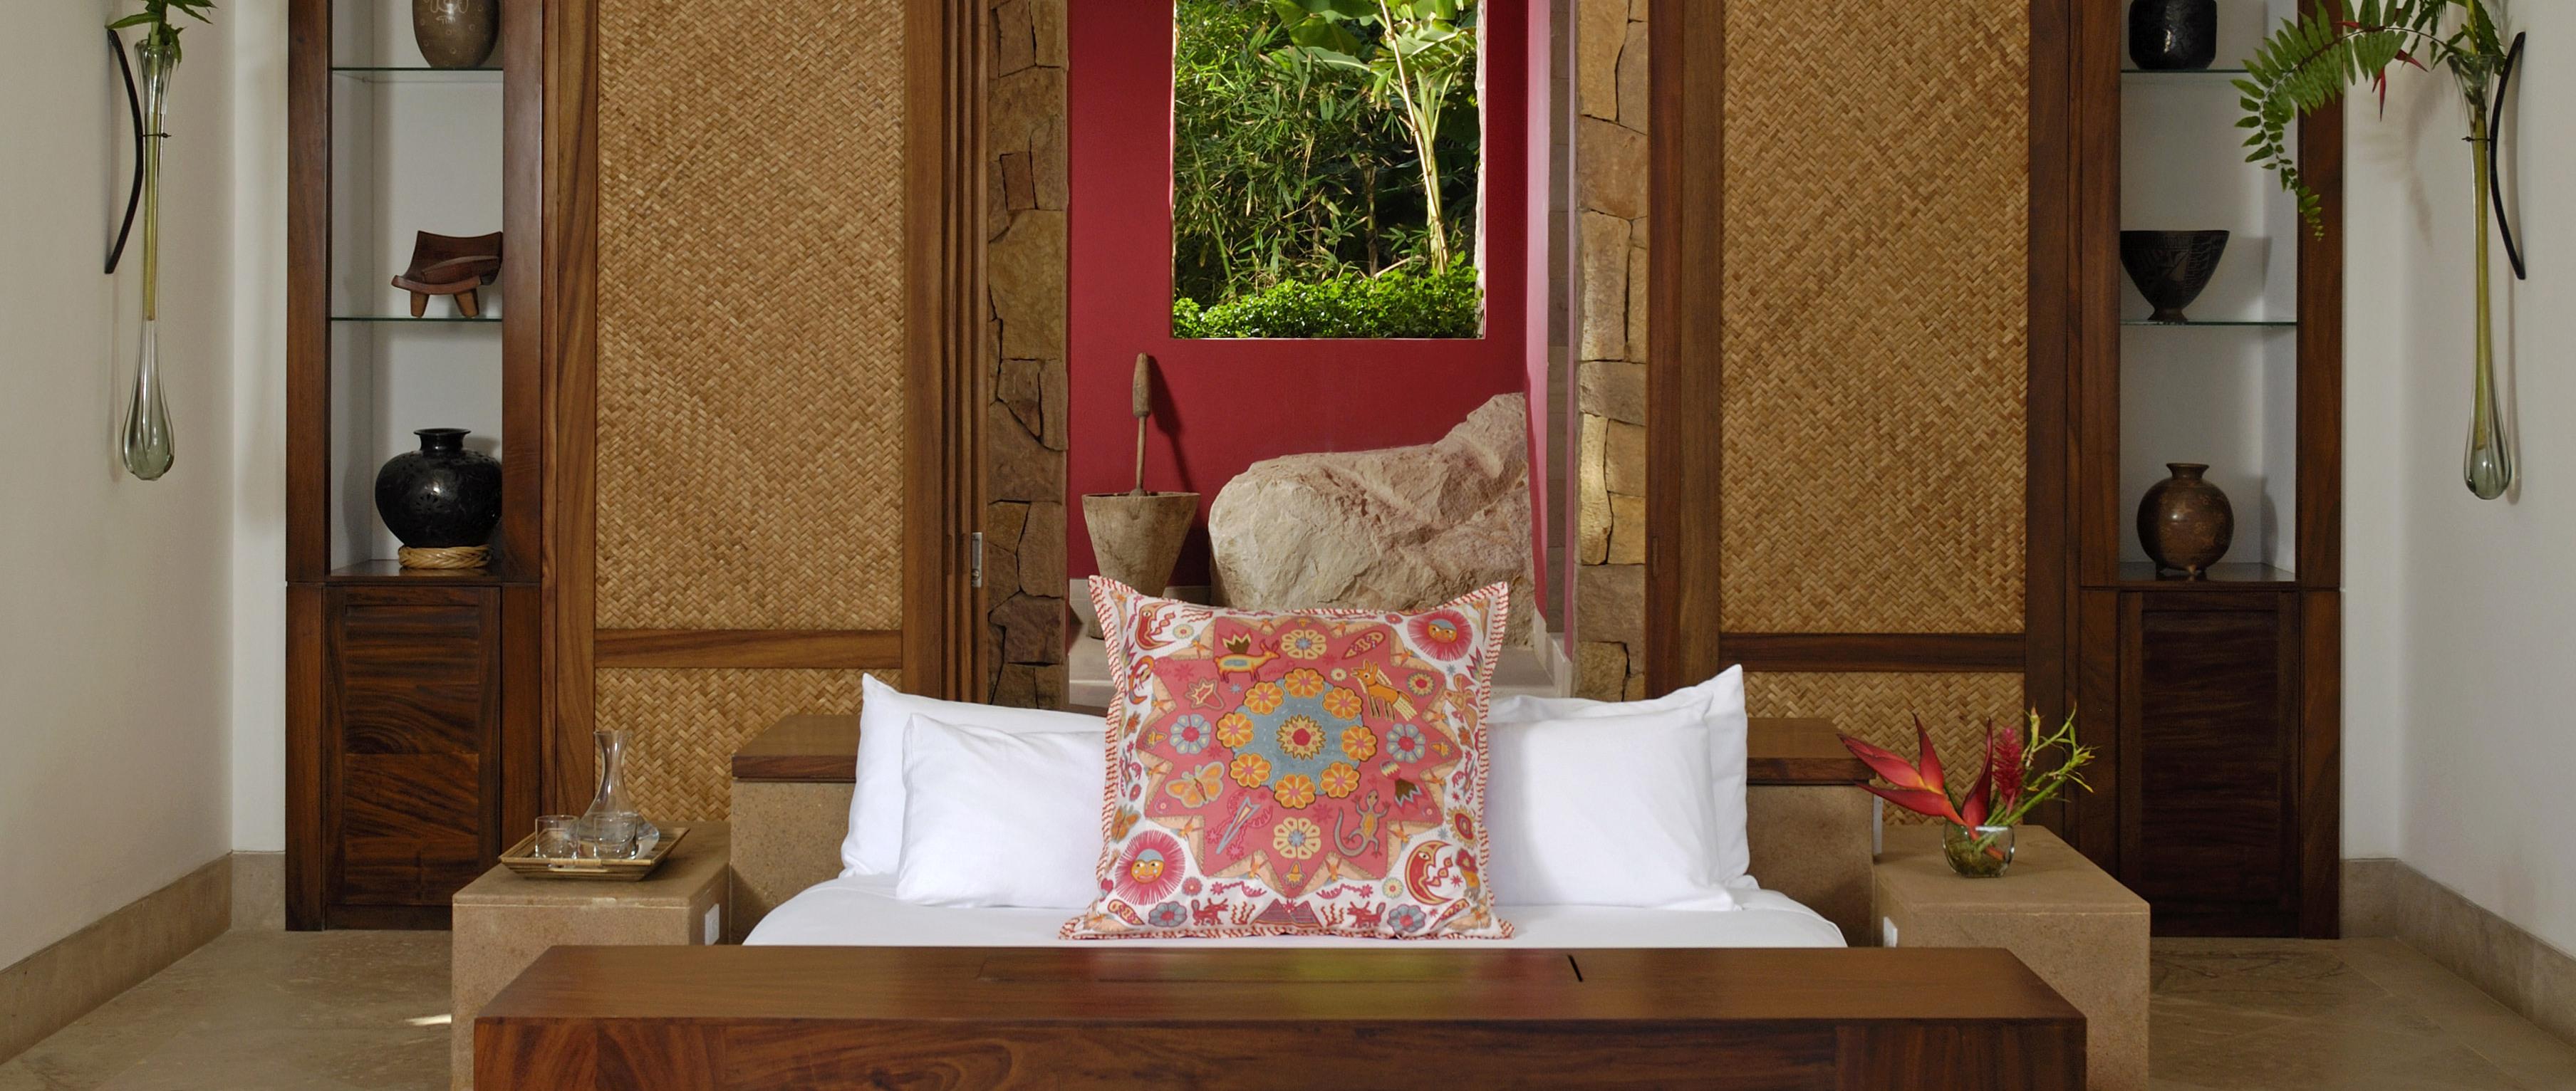 luxury-accommodation-imanta-resort